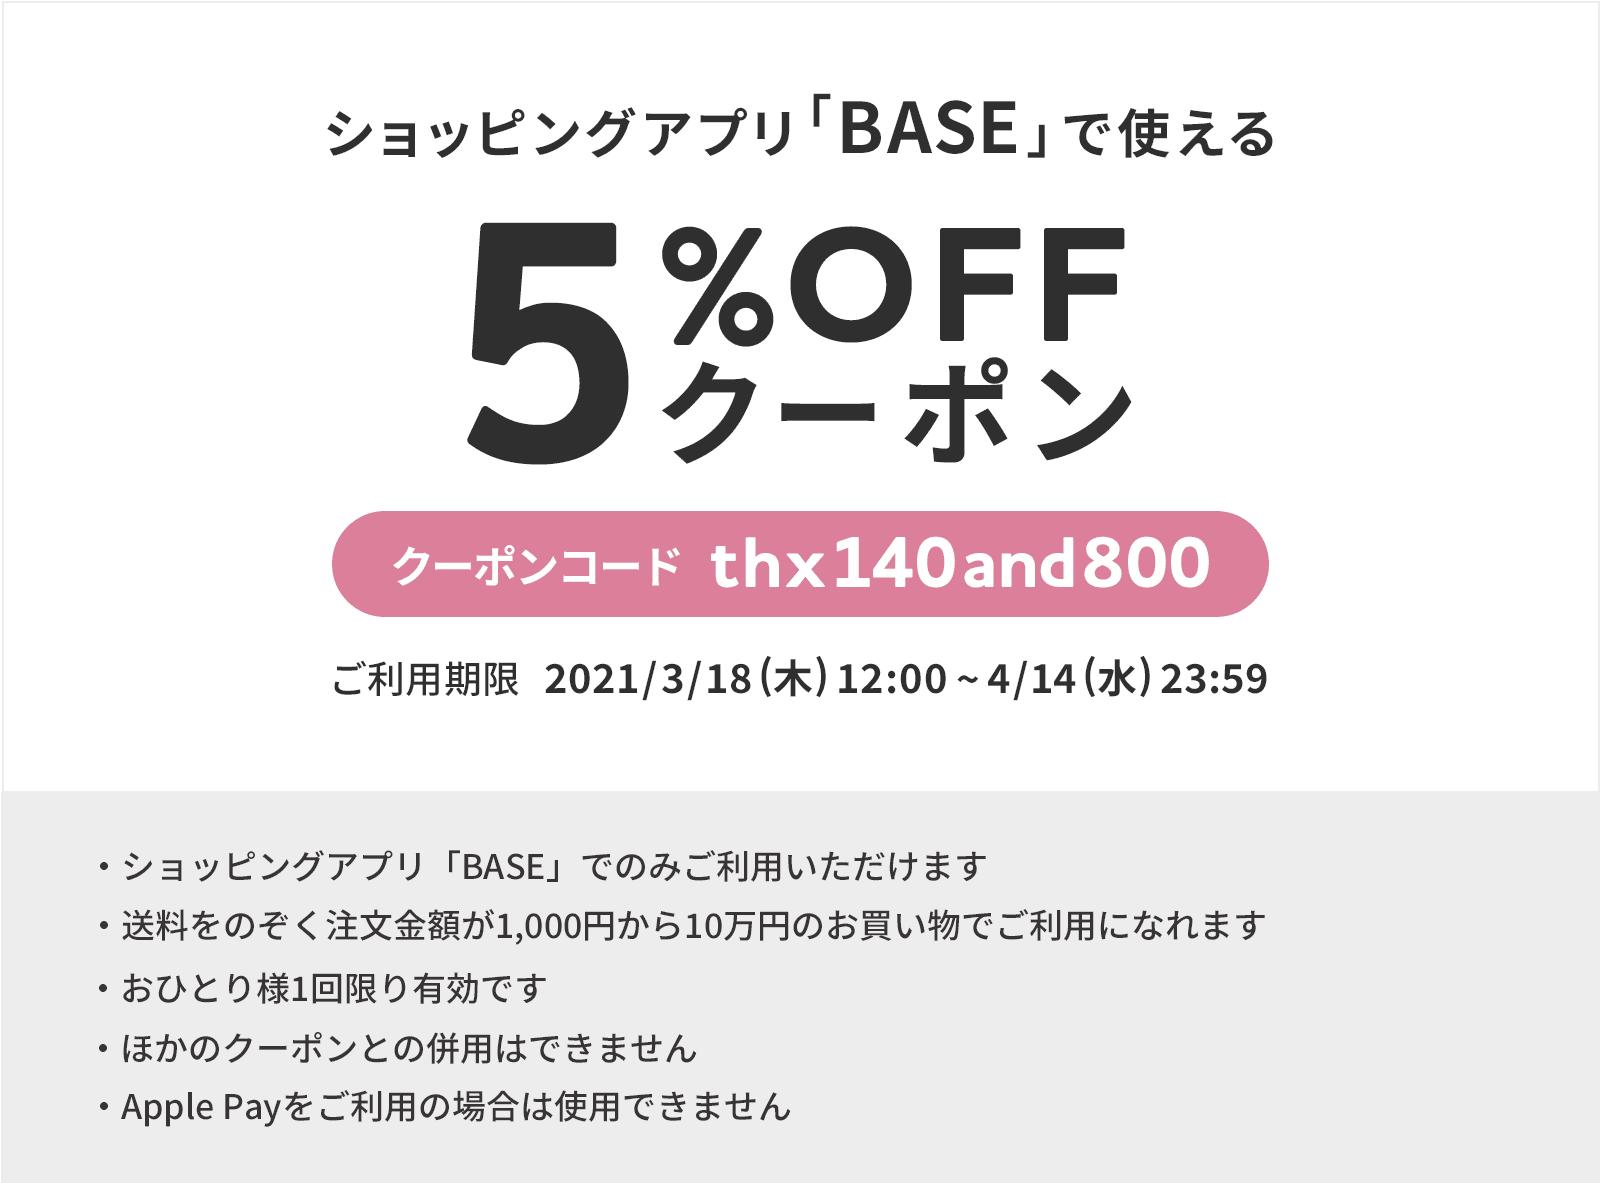 (BASEアプリ限定)5%OFFクーポン配布中(3/18~4/14)